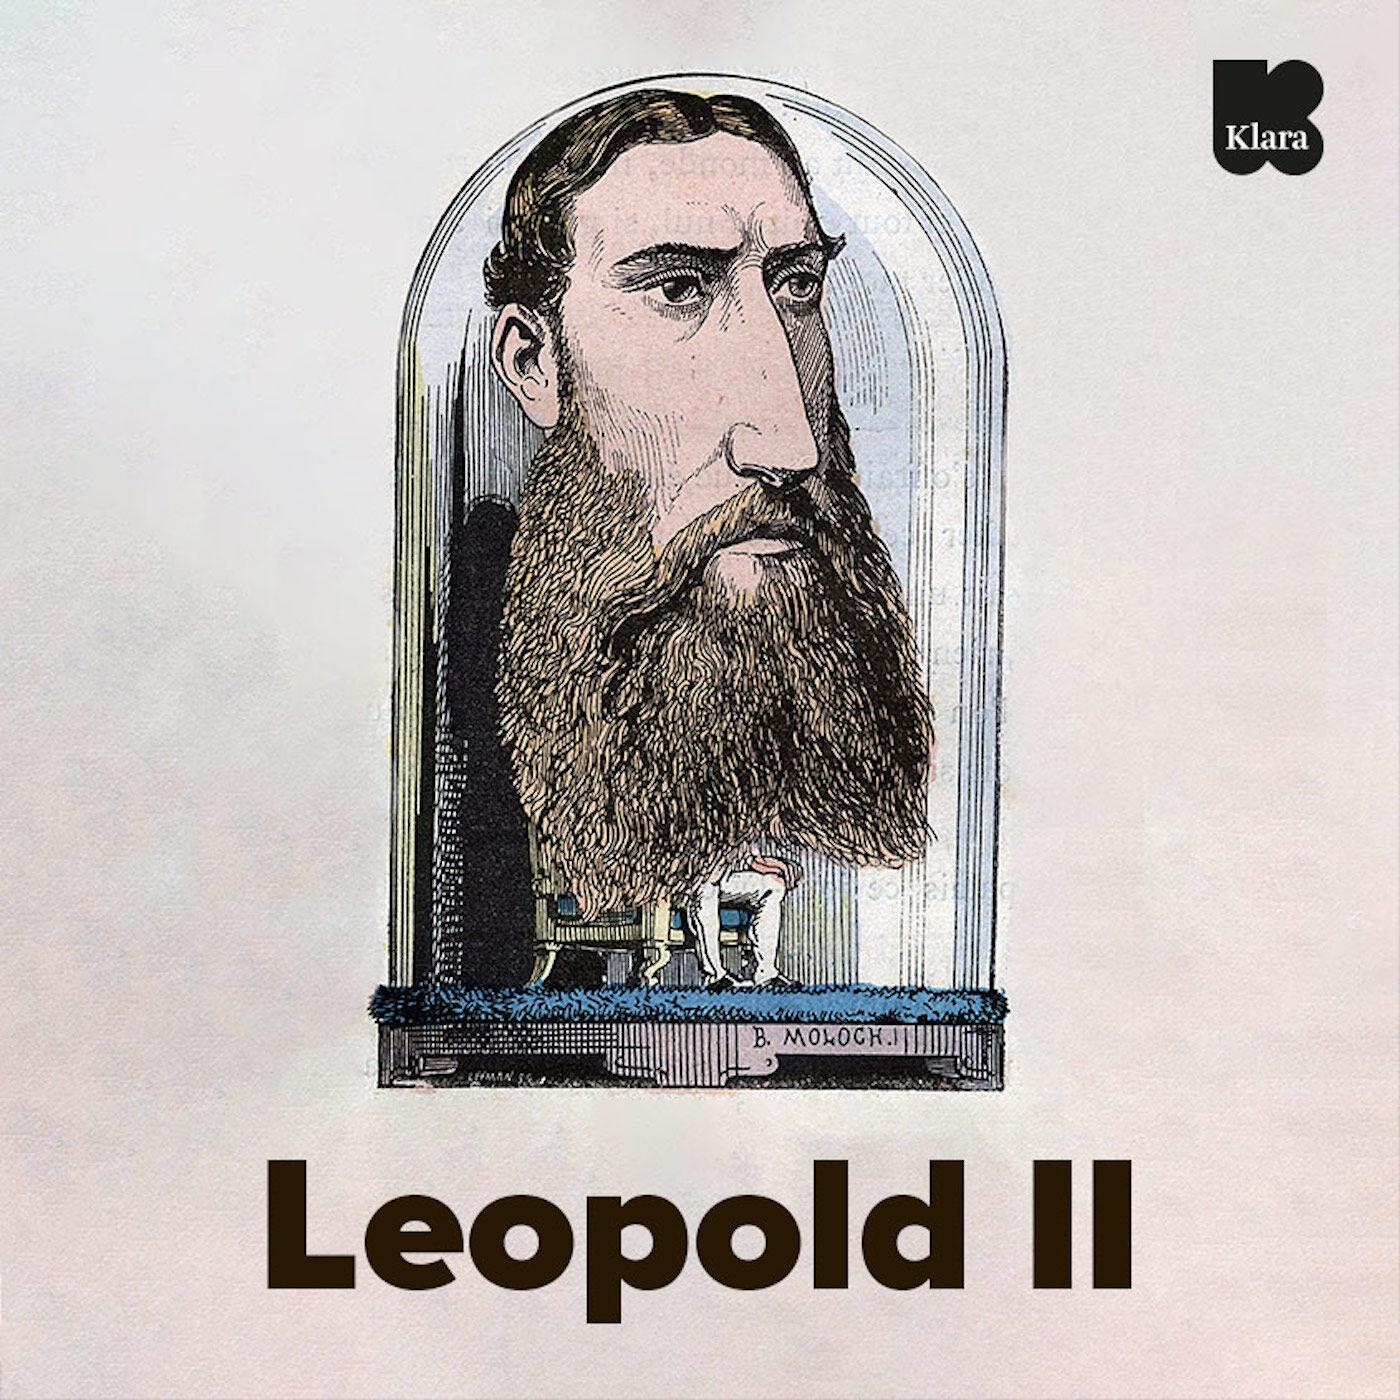 Leopold II logo